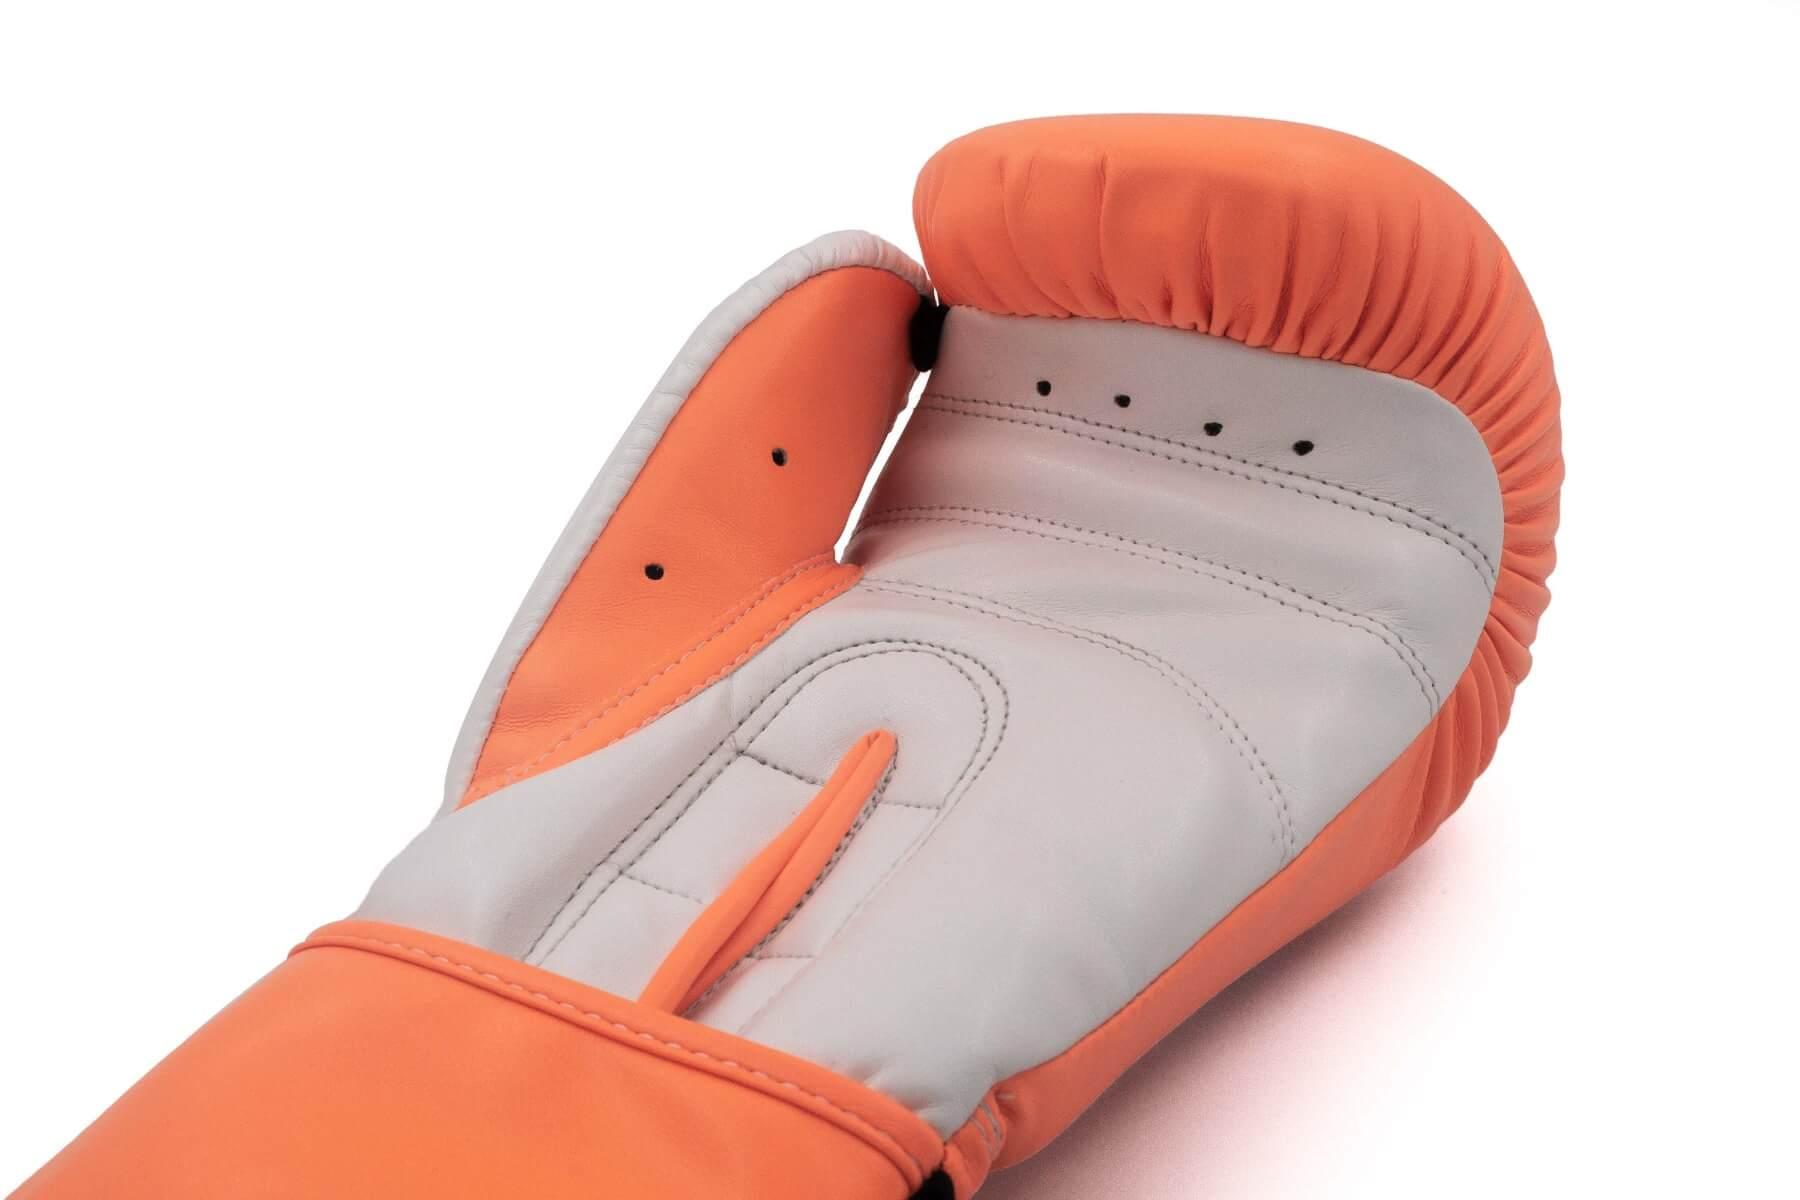 Boxhandschuh NKII Orange Innen